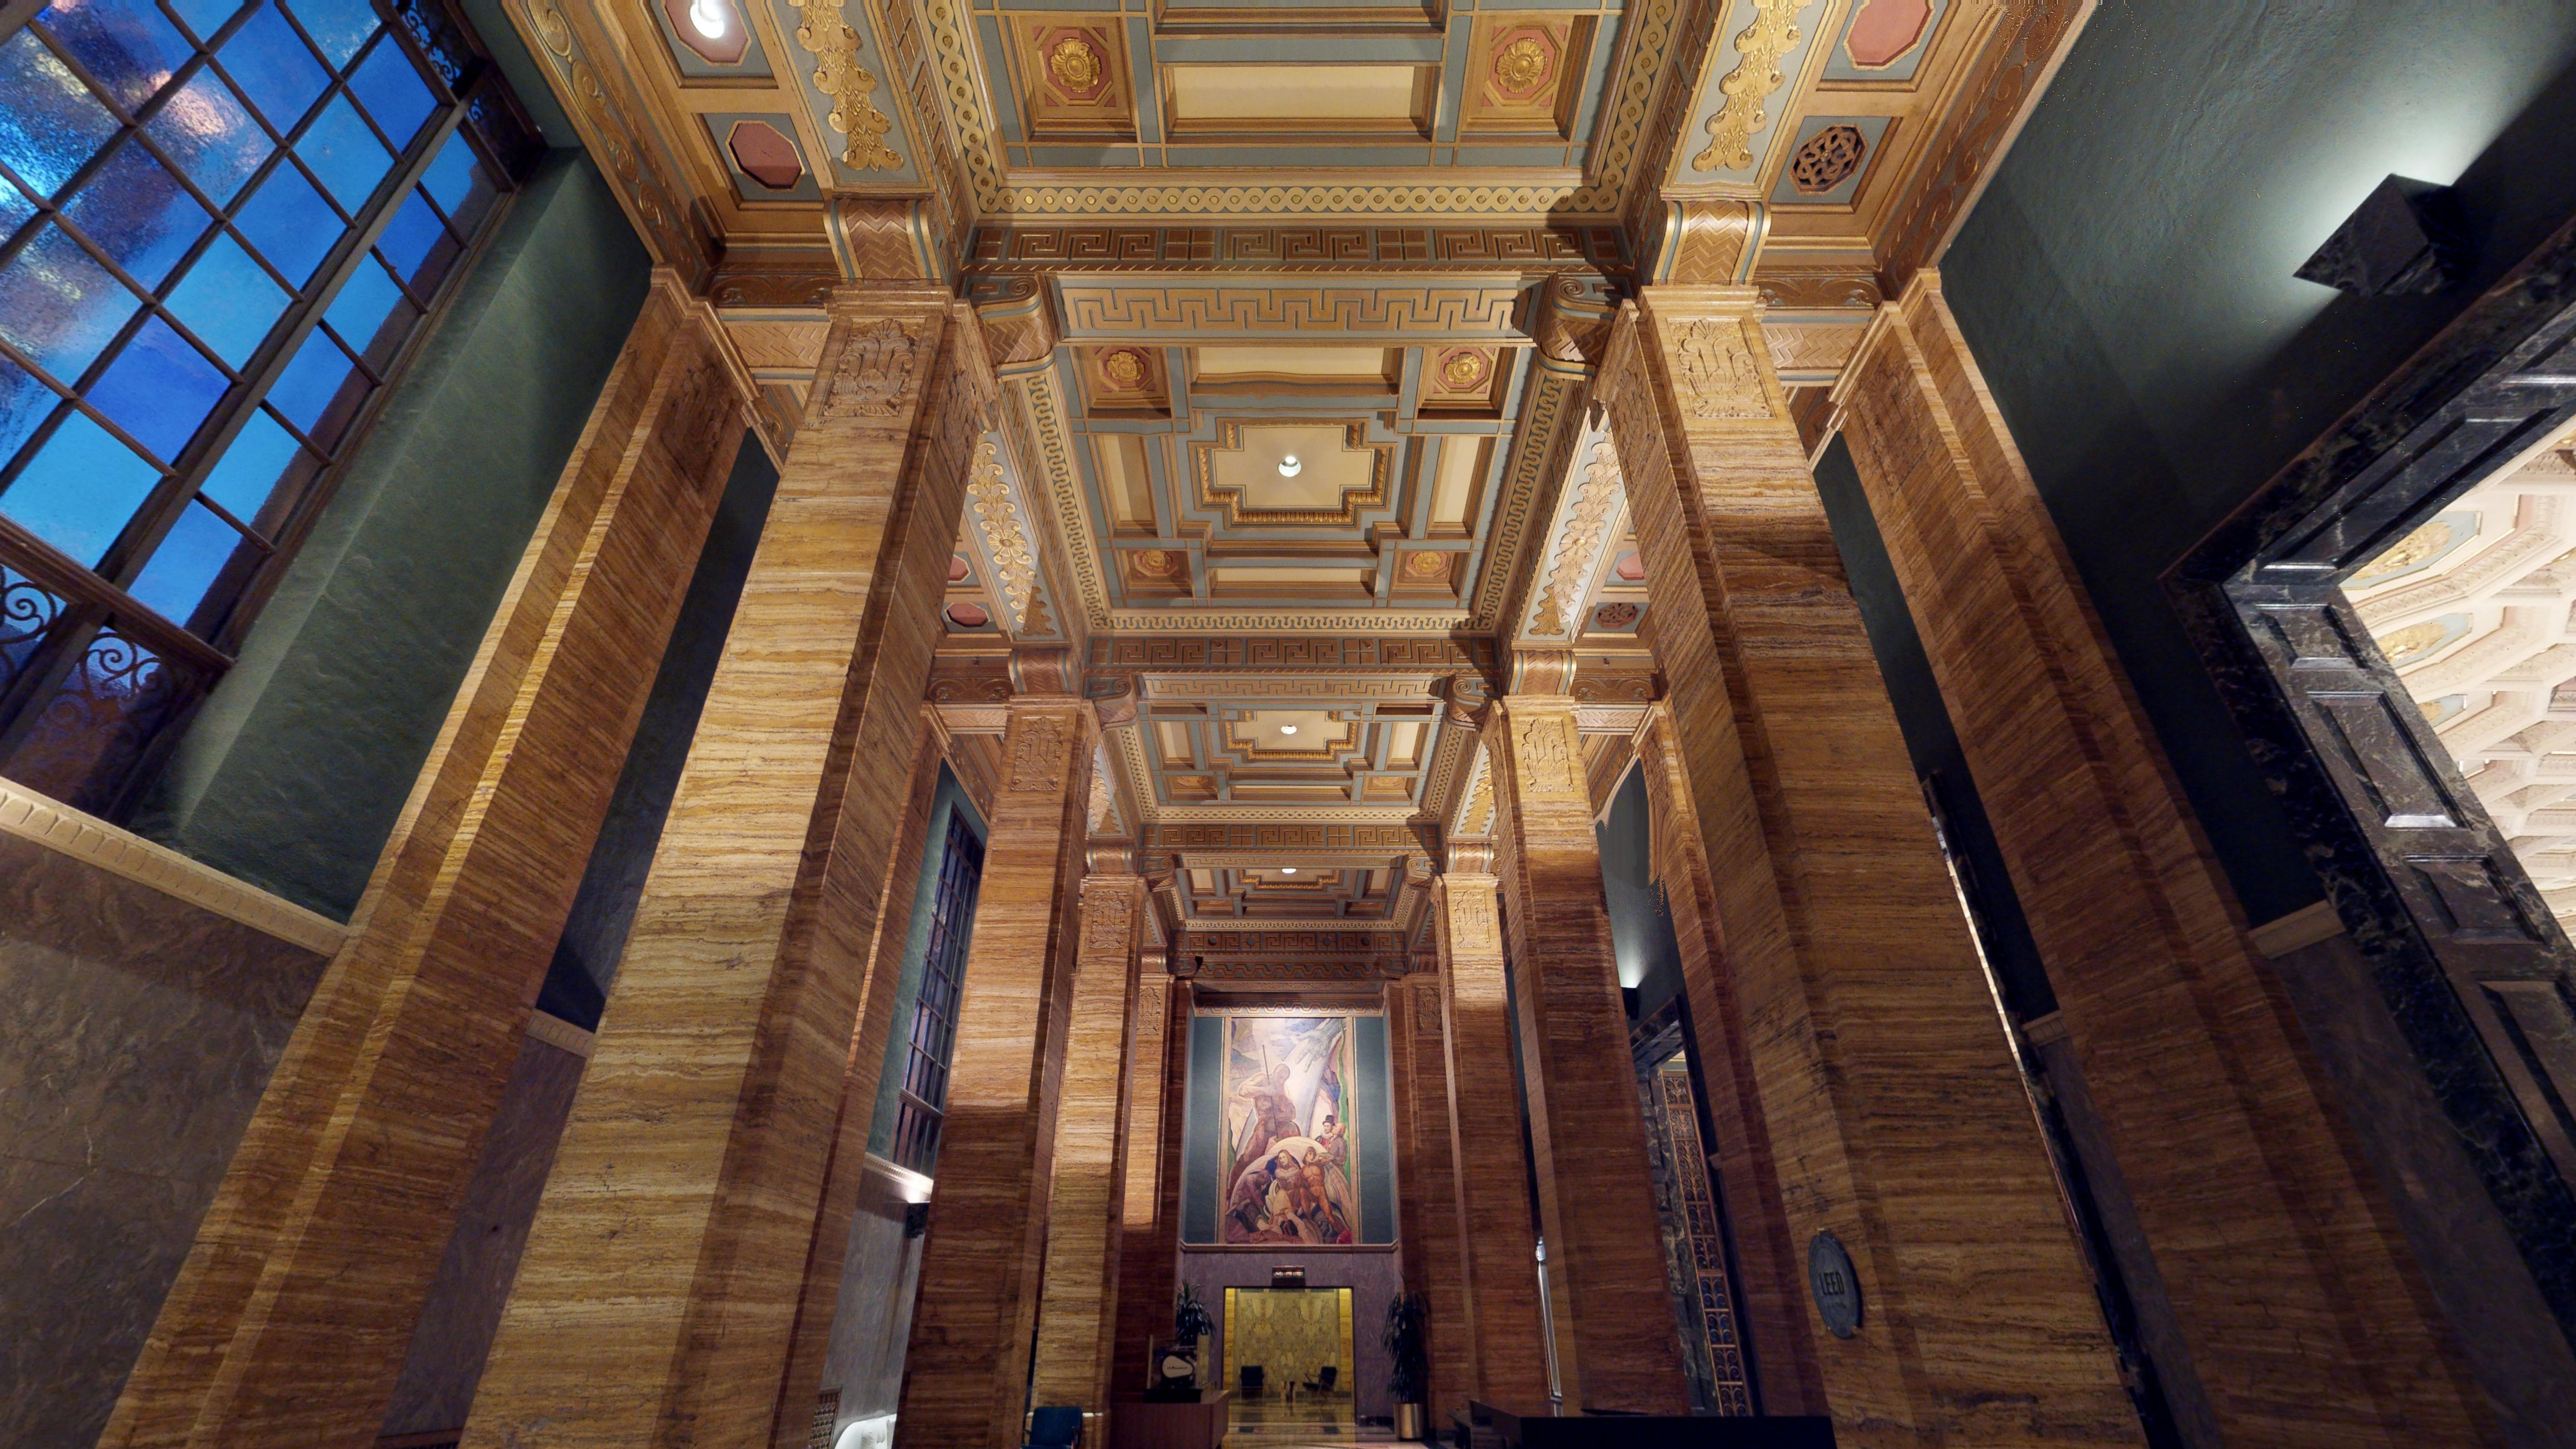 [Pro2] CalEdison's Art Deco Lobby